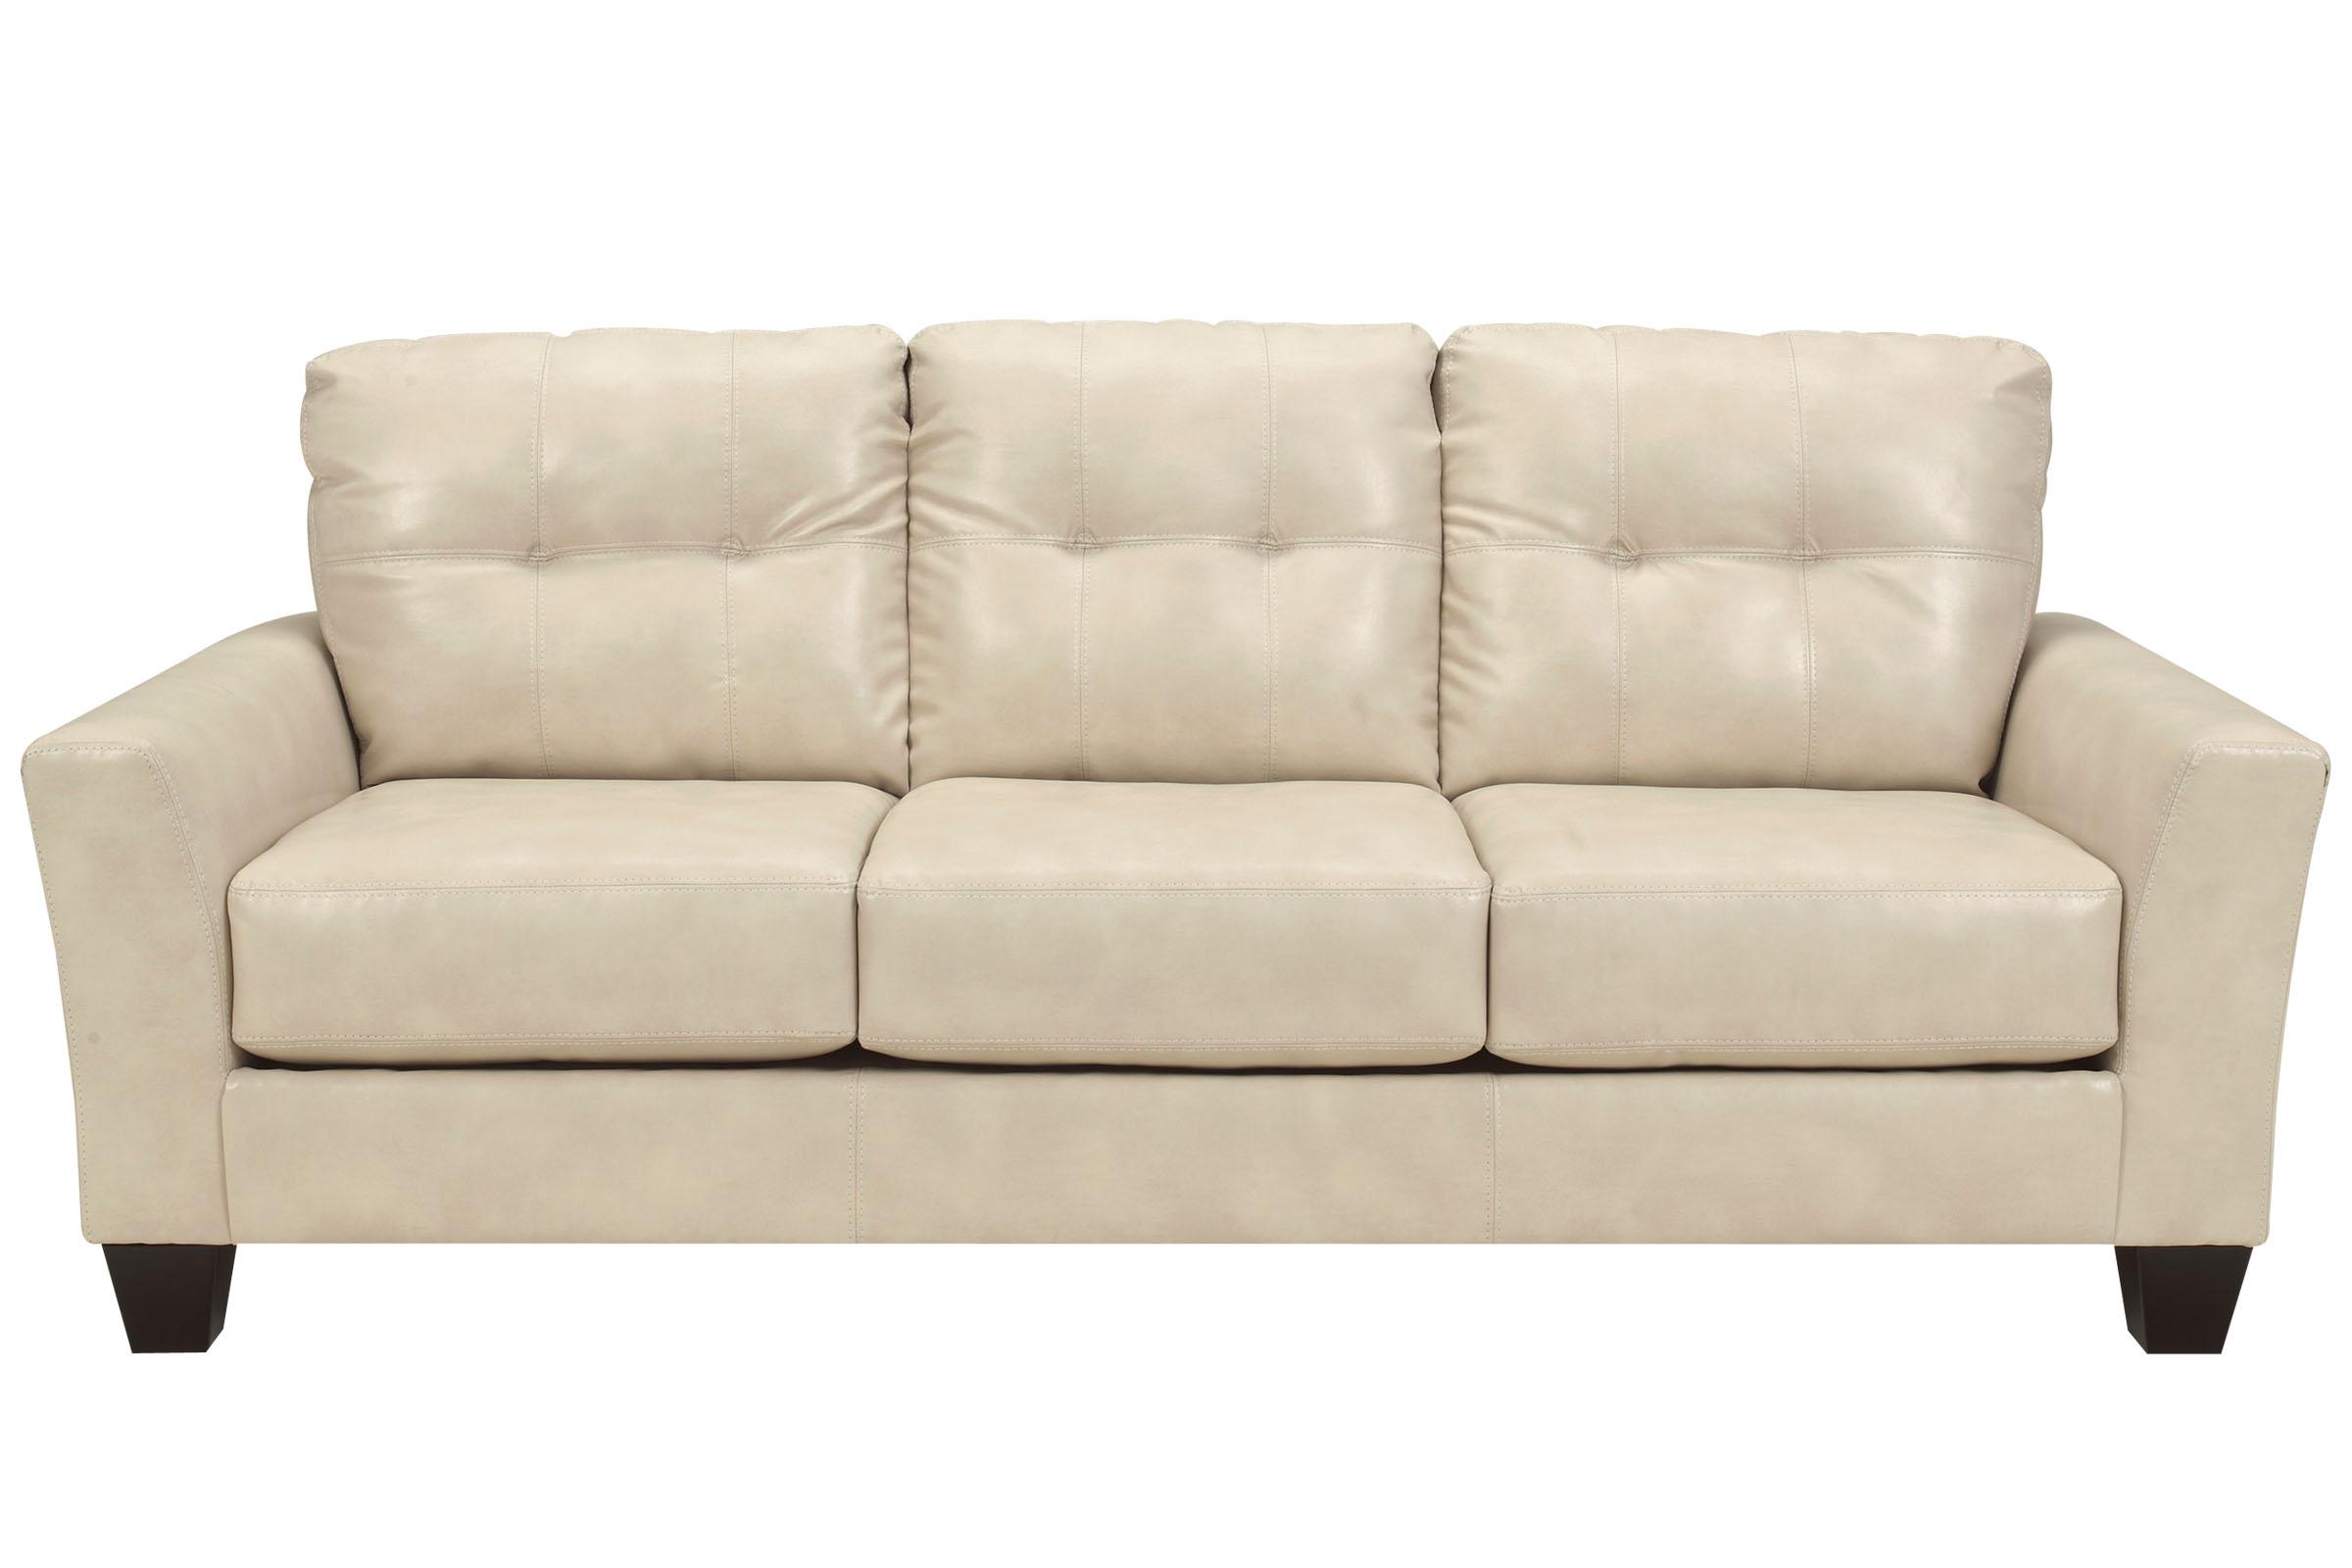 Talin Leather Sofa